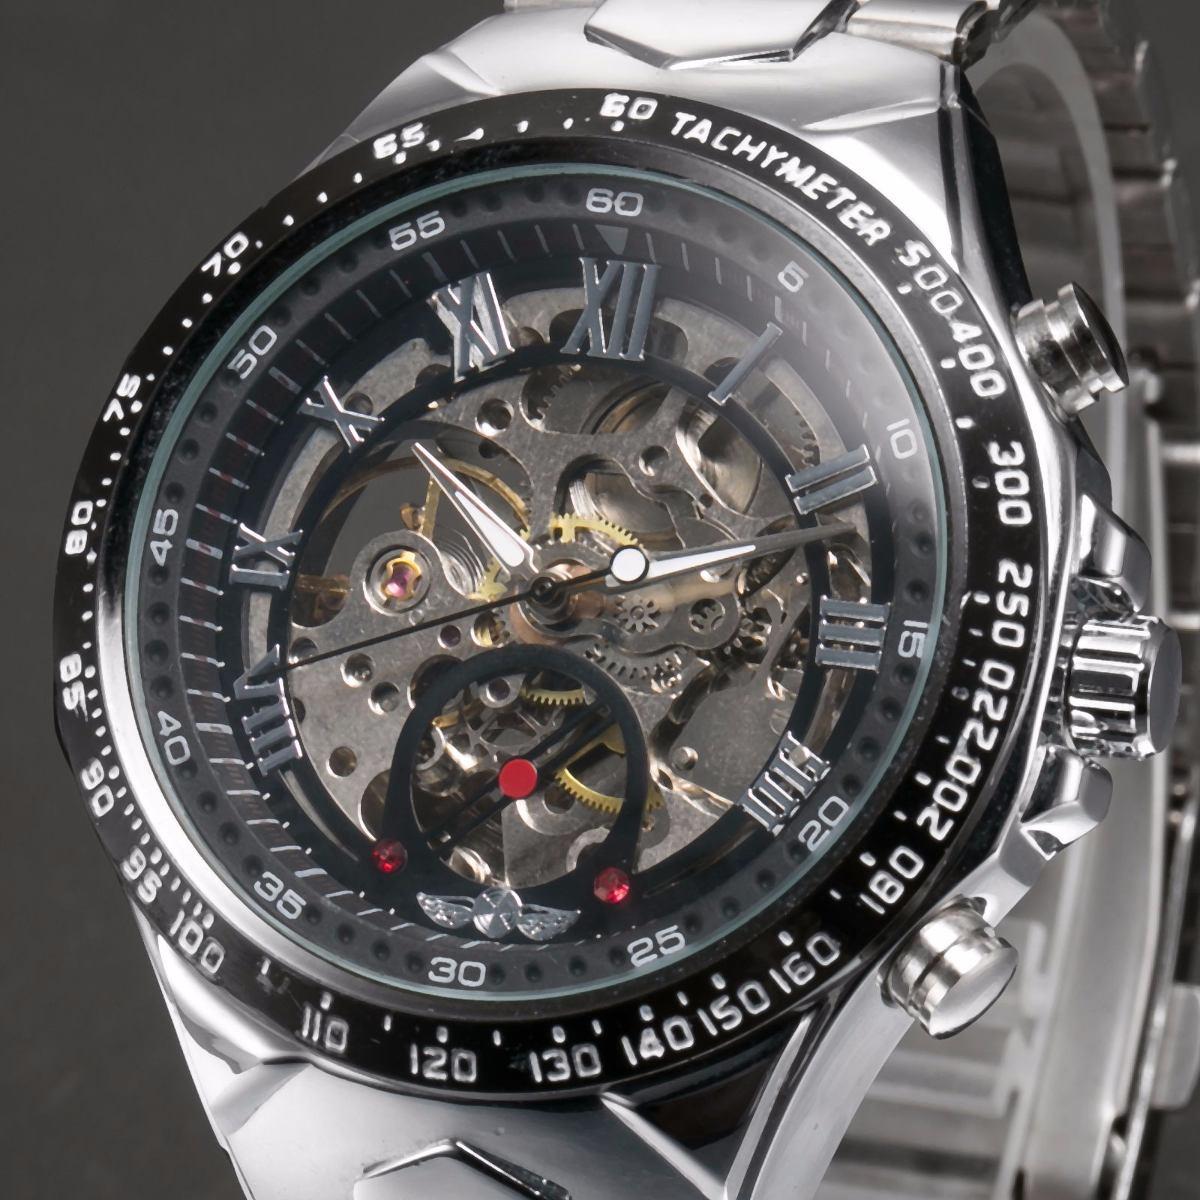 bd139548011 relógio de pulso masculino transparente automático moderno. Carregando zoom.